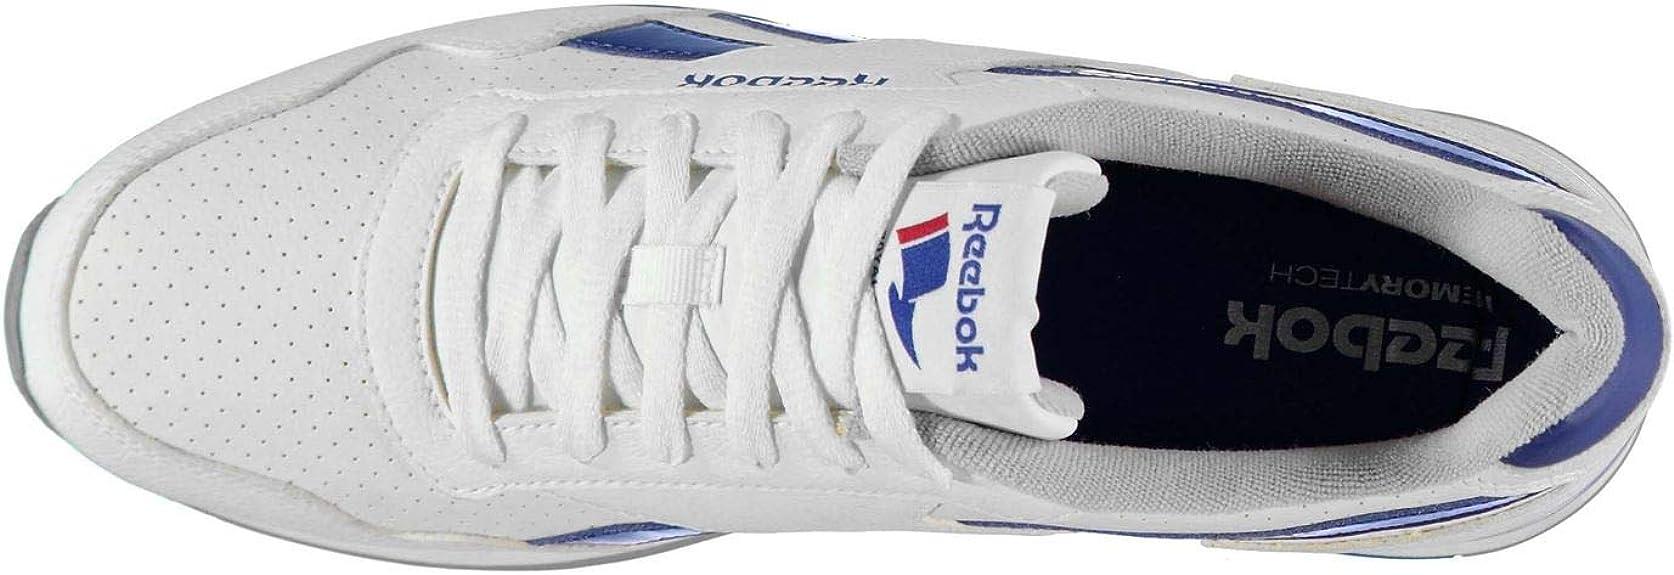 Reebok Royal Glide Clip Herren Perforiert Turnschuhe Sneaker